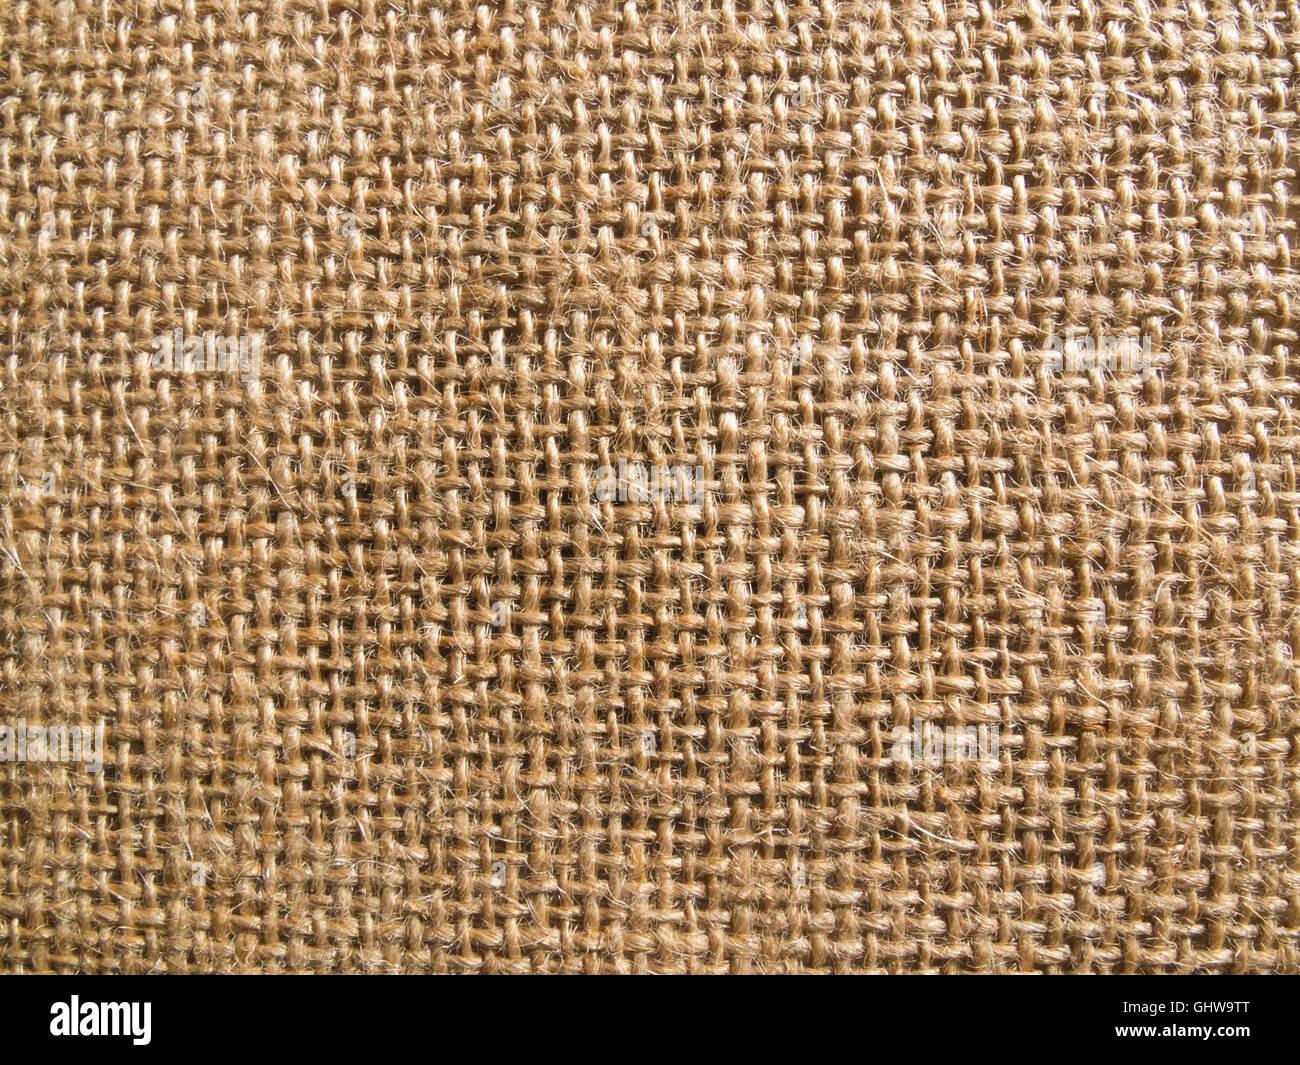 hessian fabric - Stock Image